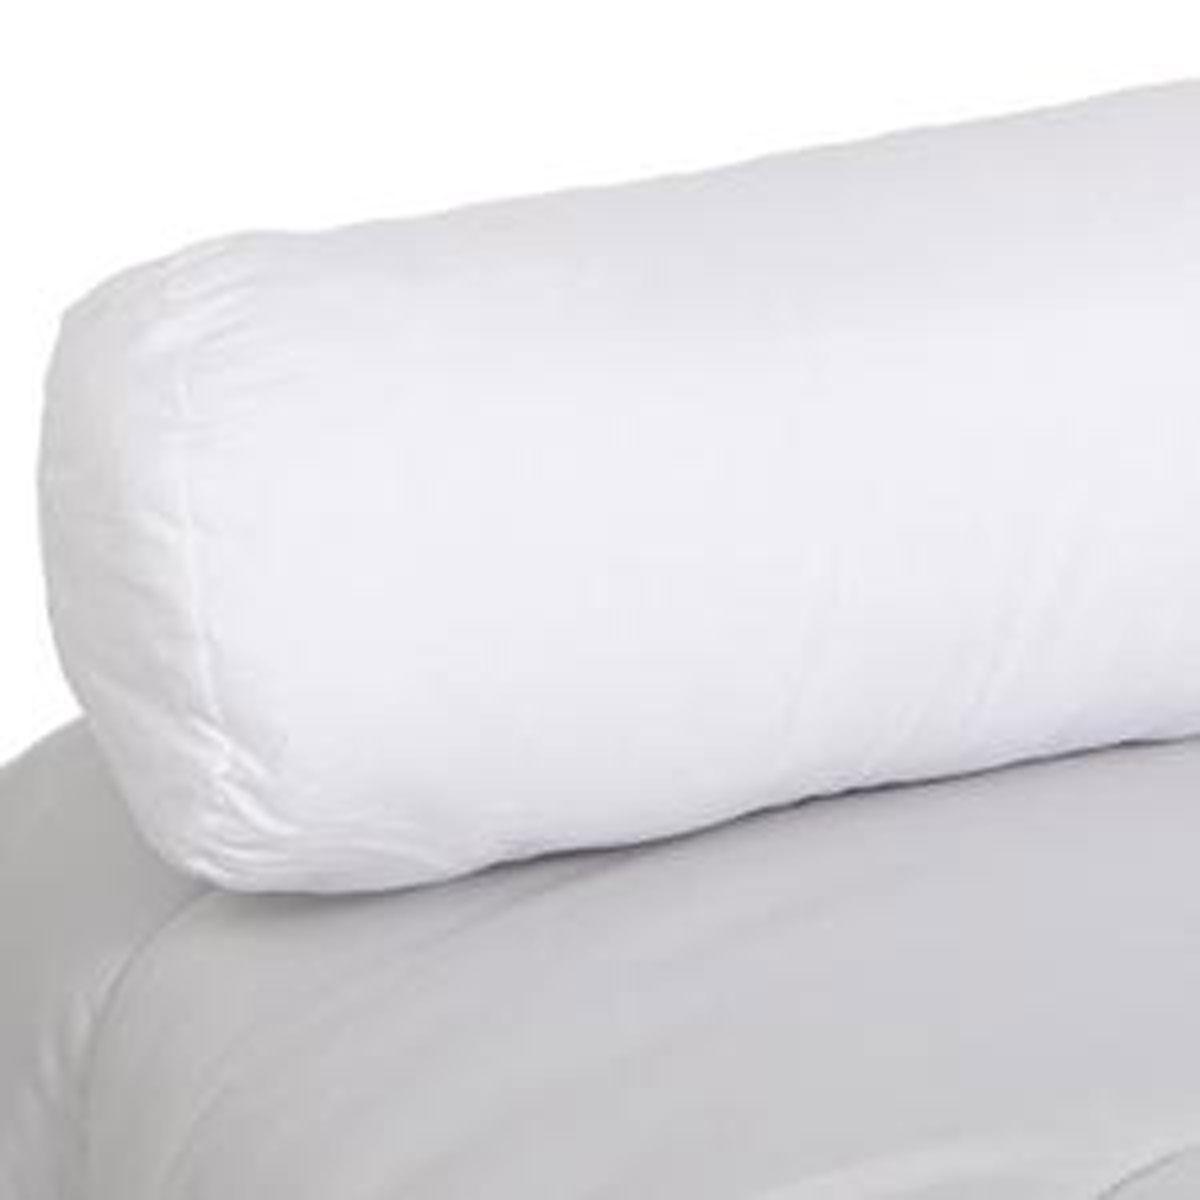 traversin en bambou blanc homemaison vente en ligne oreillers traversins. Black Bedroom Furniture Sets. Home Design Ideas